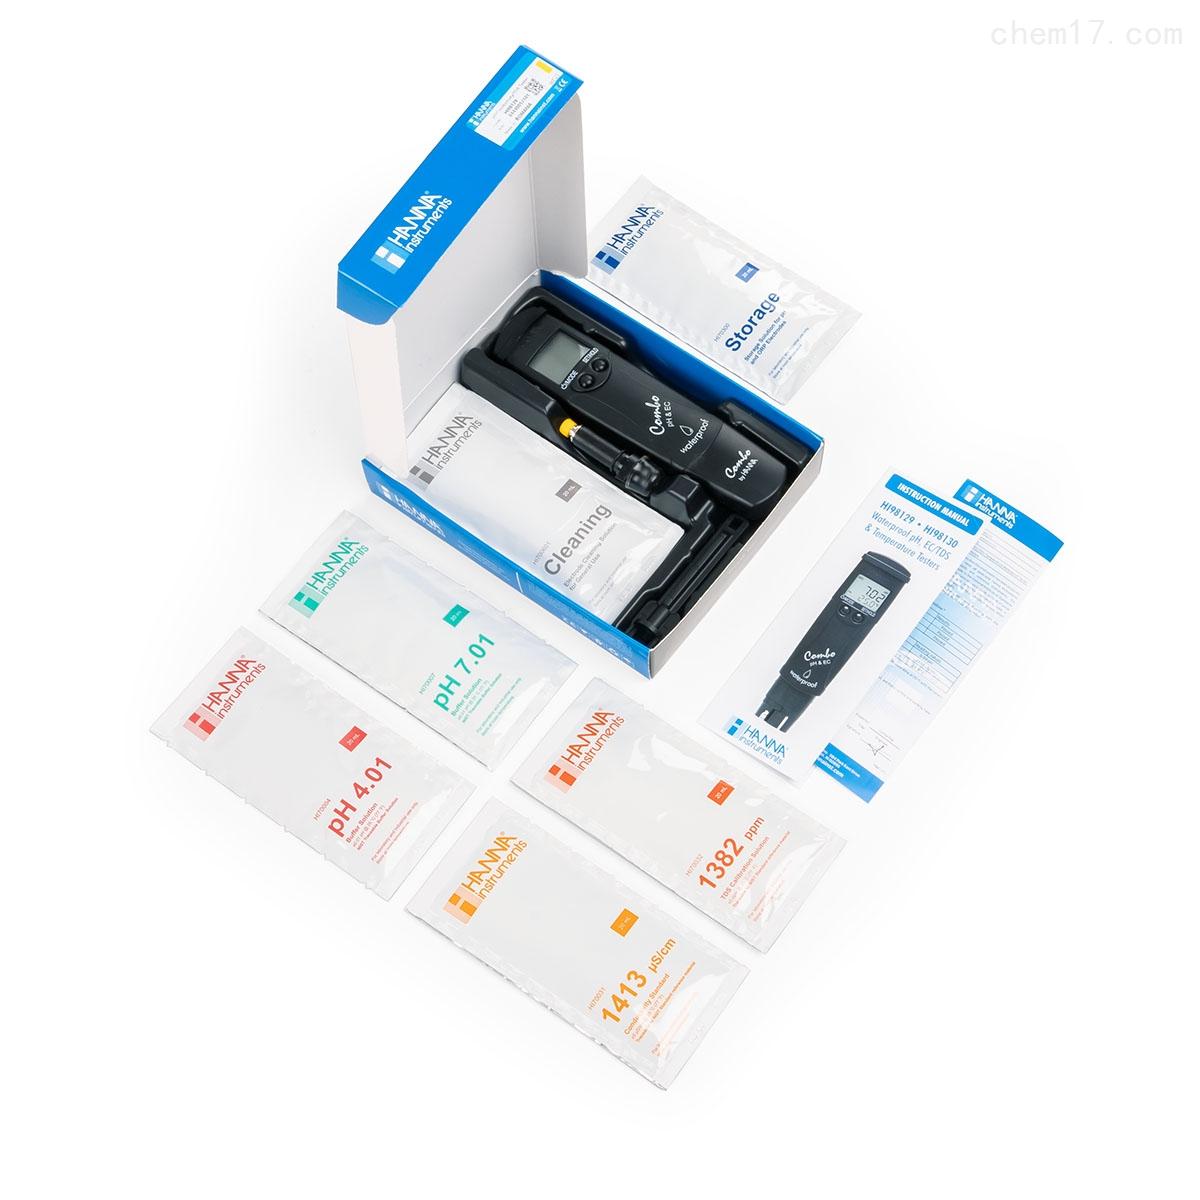 HI98129 低量程 pH-EC-TDS-℃测定仪